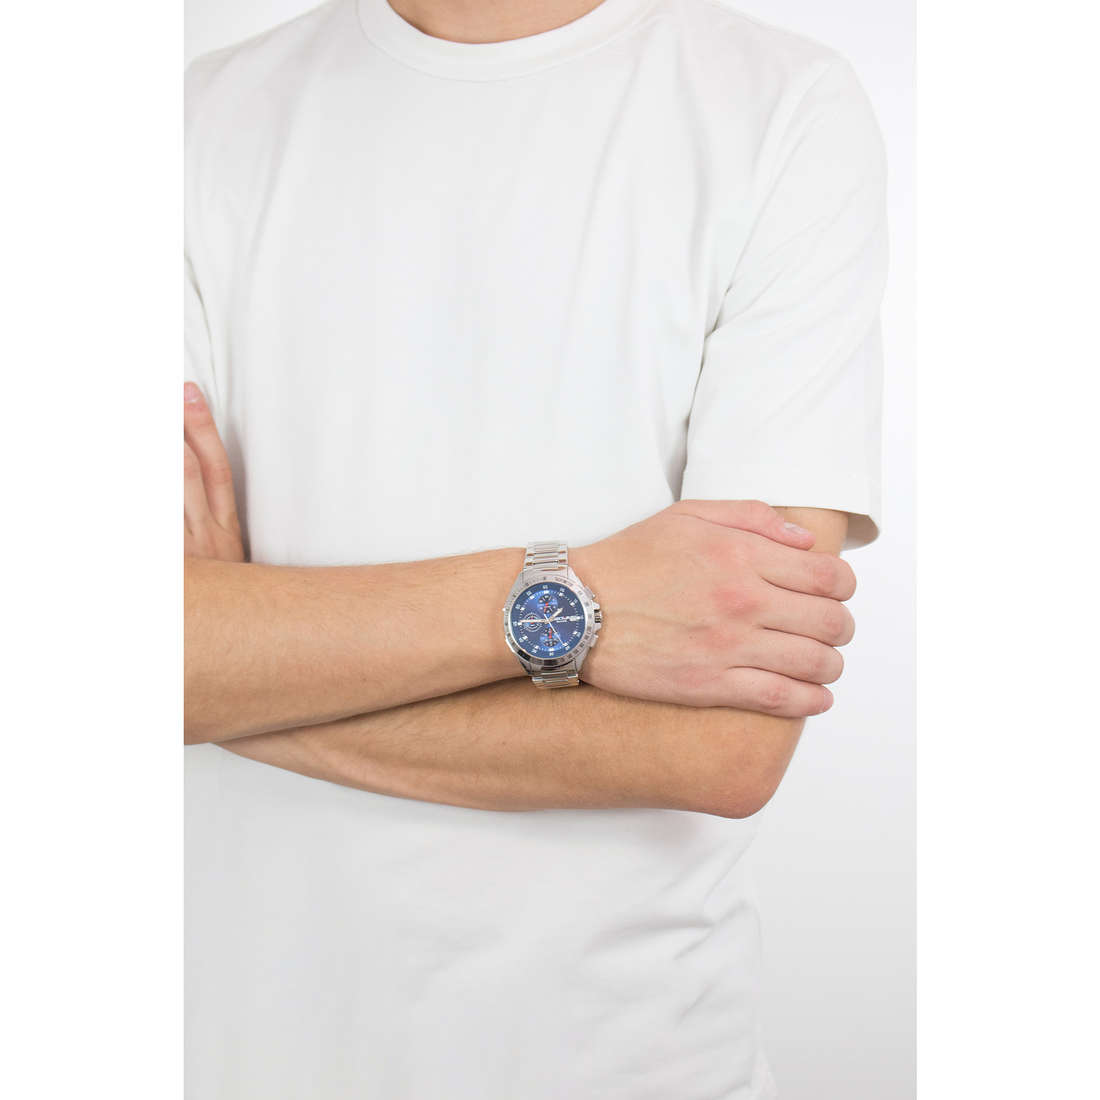 Sector cronografi uomo R3273687002 indosso